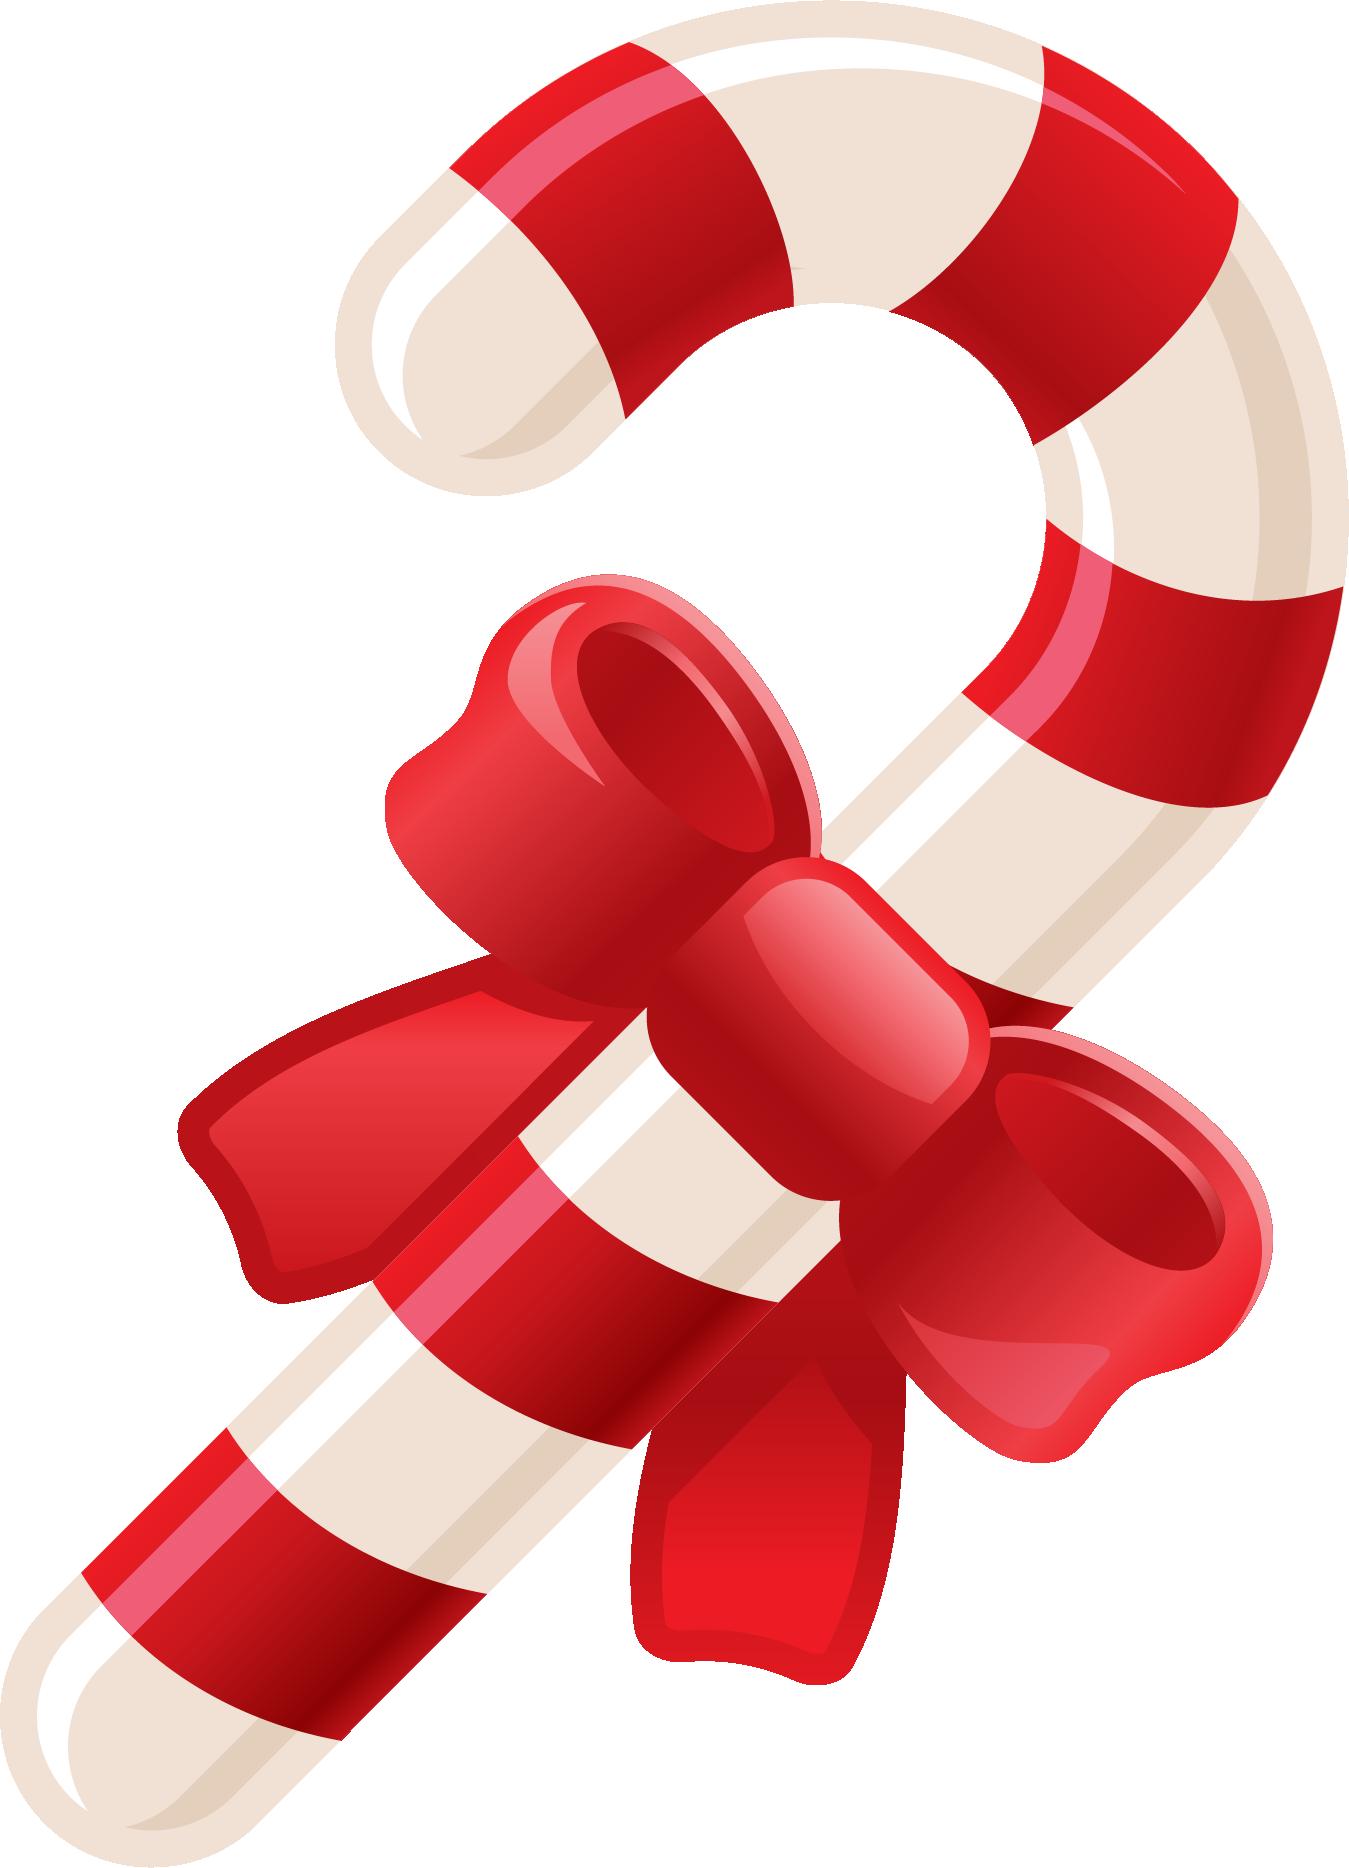 1349x1868 December Holiday Clip Art Free Microsoft